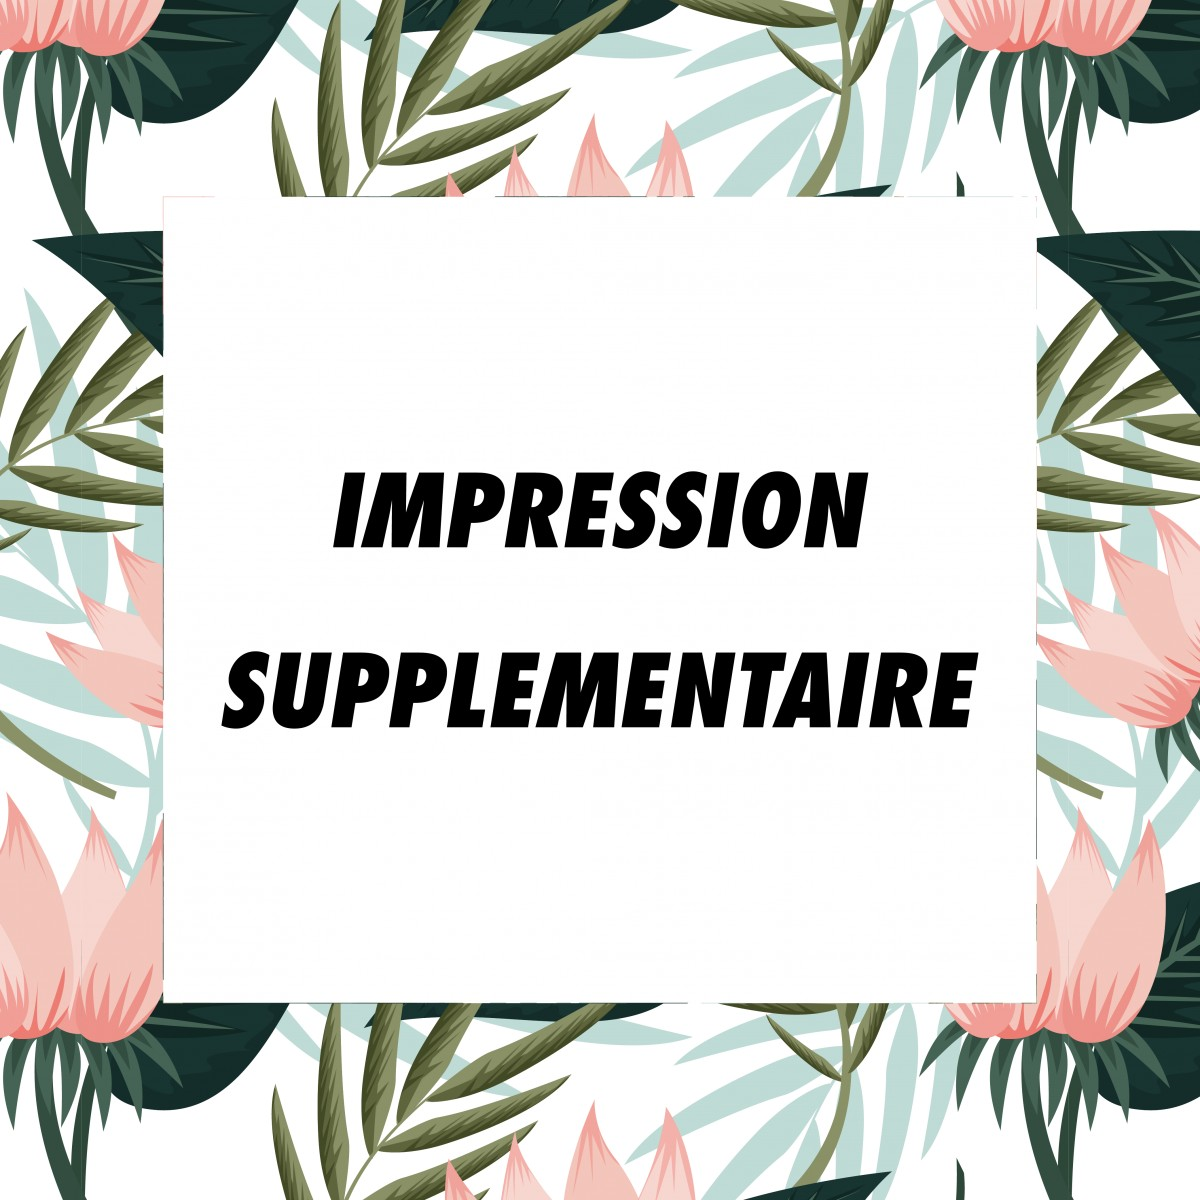 Marcel et Maurice - Impression supplémentaire full print